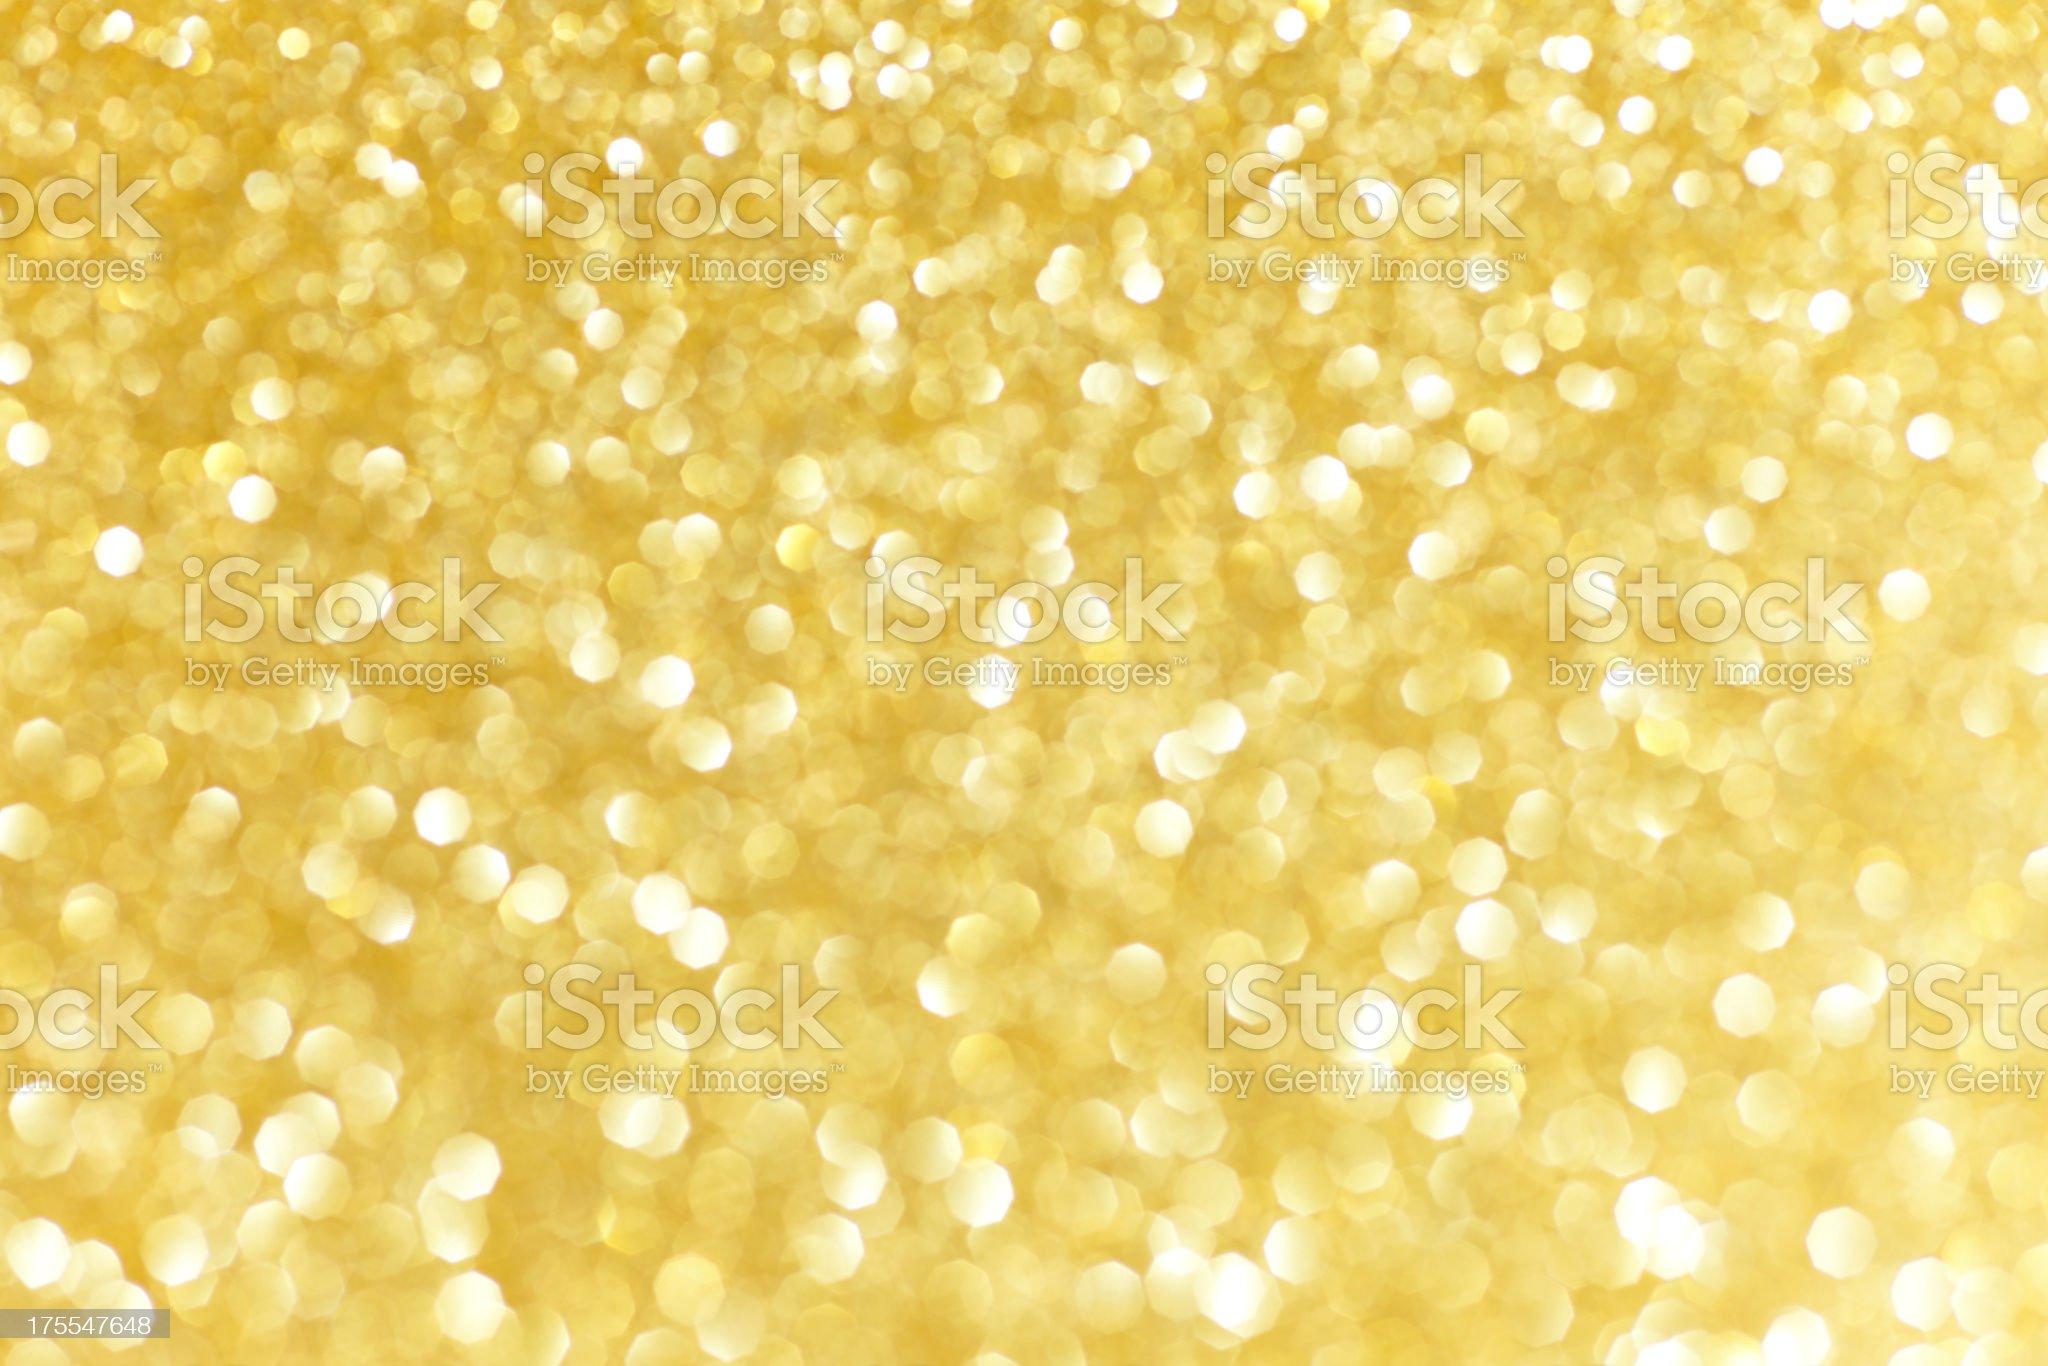 defocused golden glittering background royalty-free stock photo